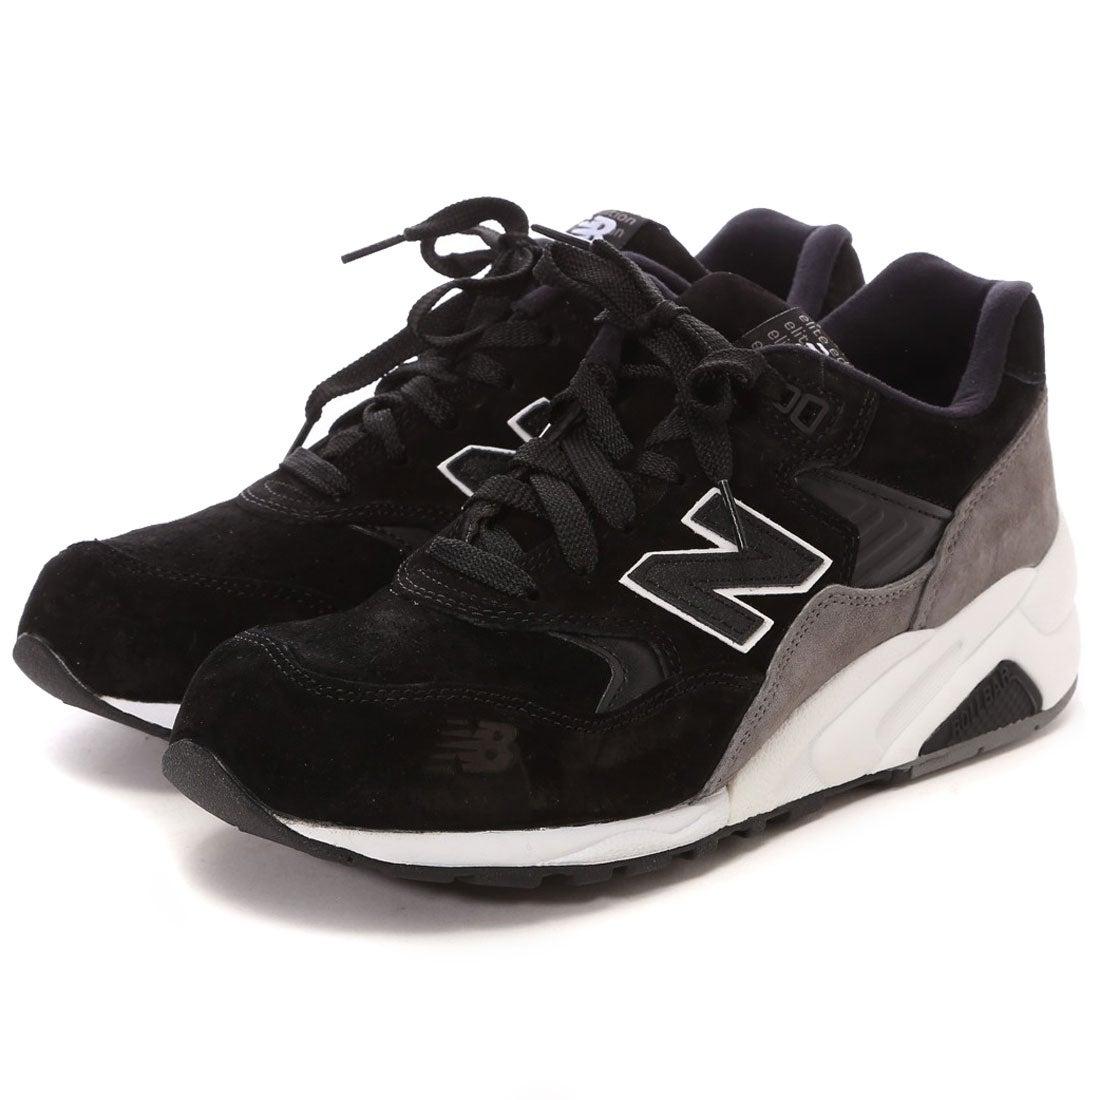 efd0b2d769e08 ニューバランス new balance CHAPTER MT580 MBK(BLACK/GRAY) -靴&ファッション通販  ロコンド〜自宅で試着、気軽に返品